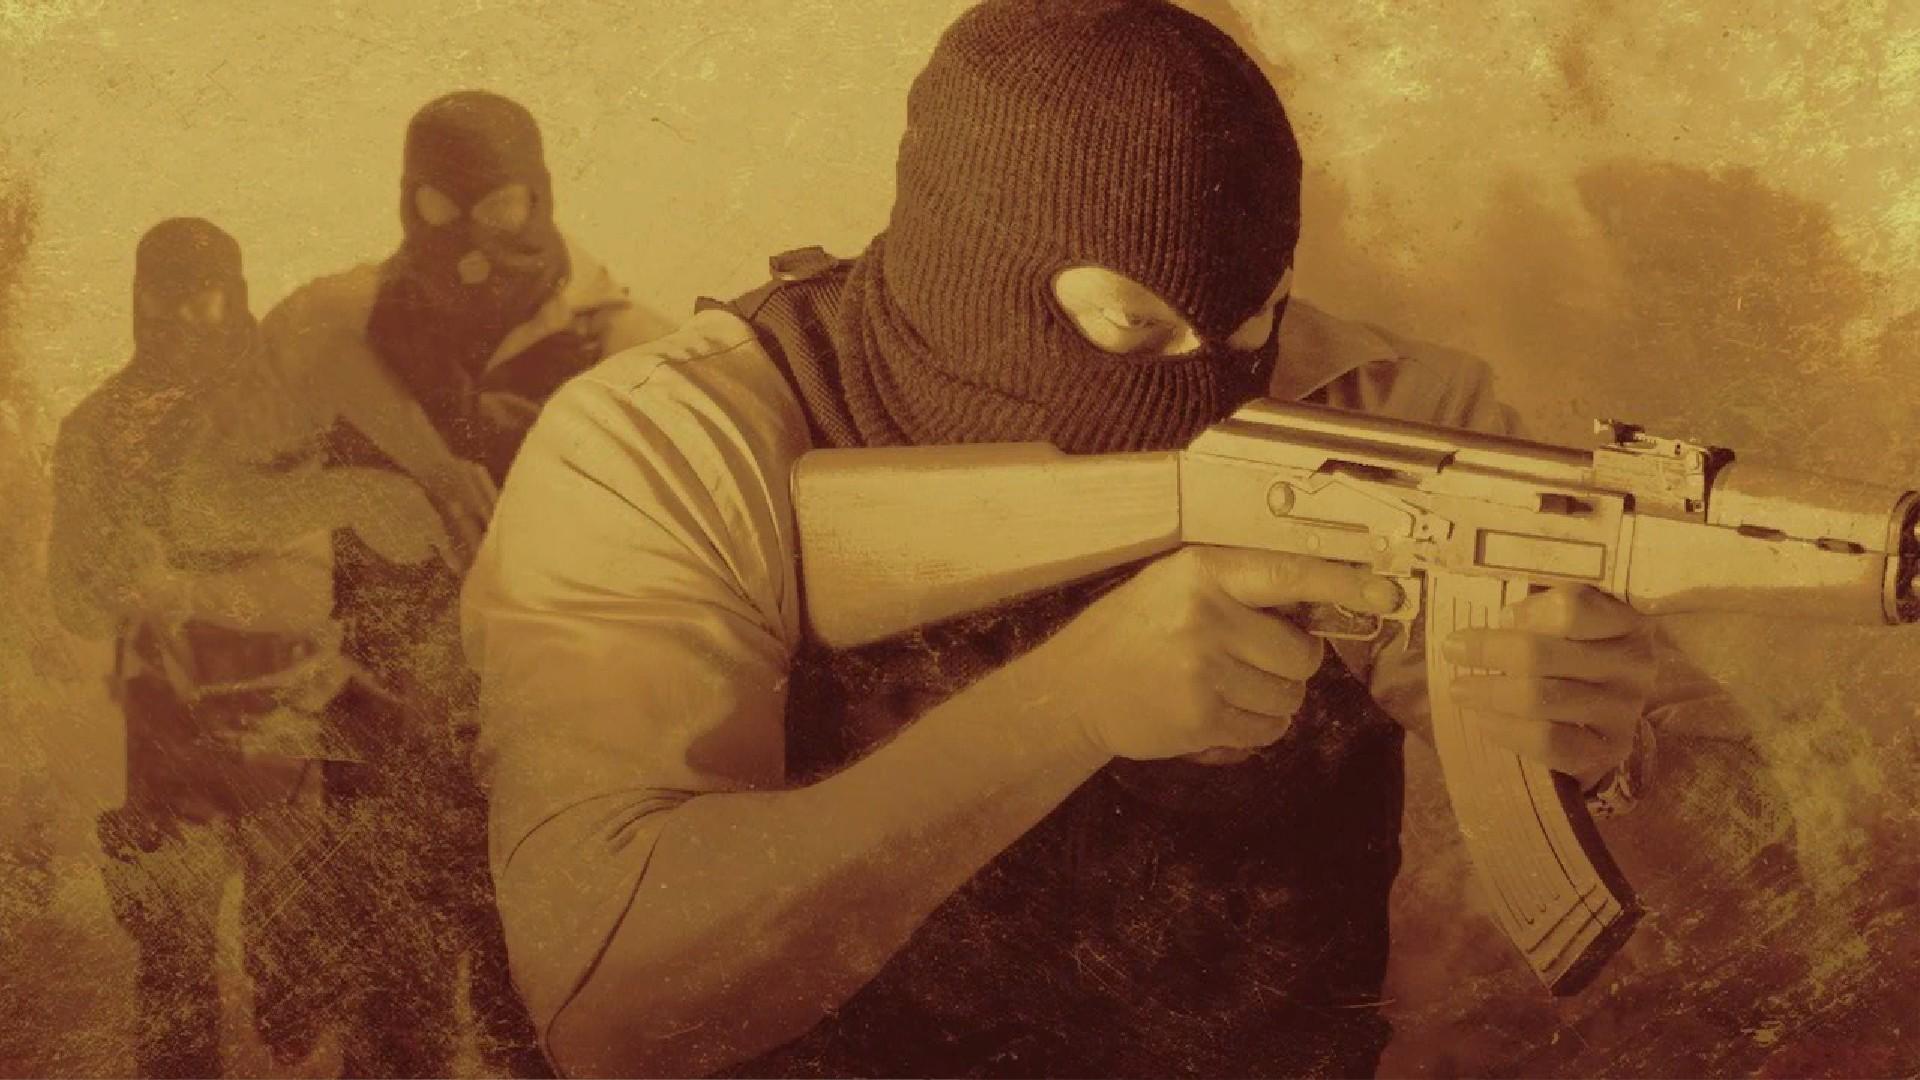 Terrorist Photo: Counter Strike Wallpaper Terrorists ·①